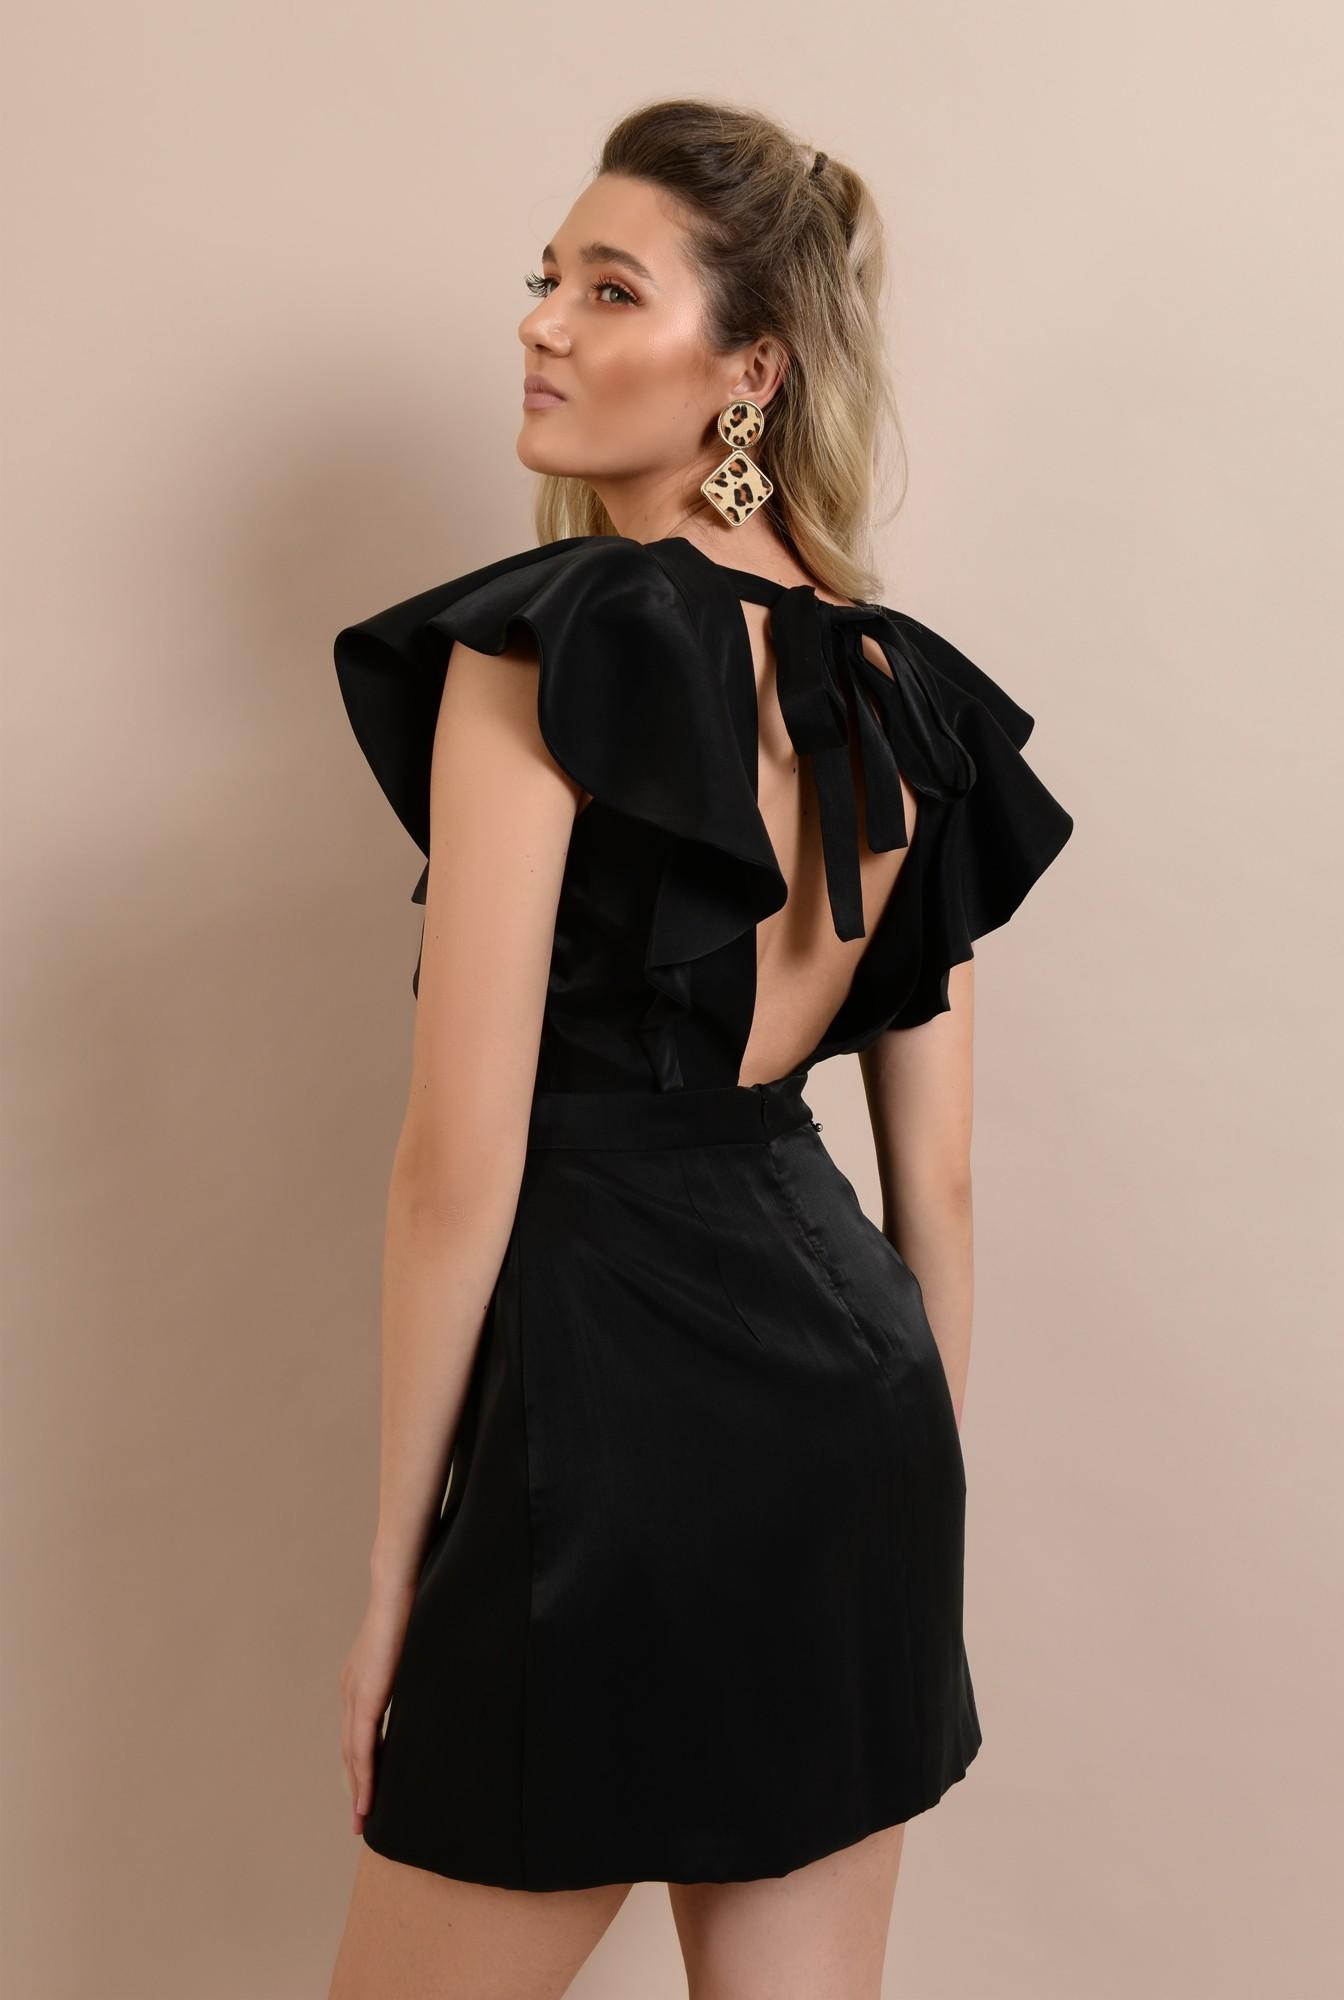 1 - rochie scurta, mini, cu volane, funda la spate, anchior